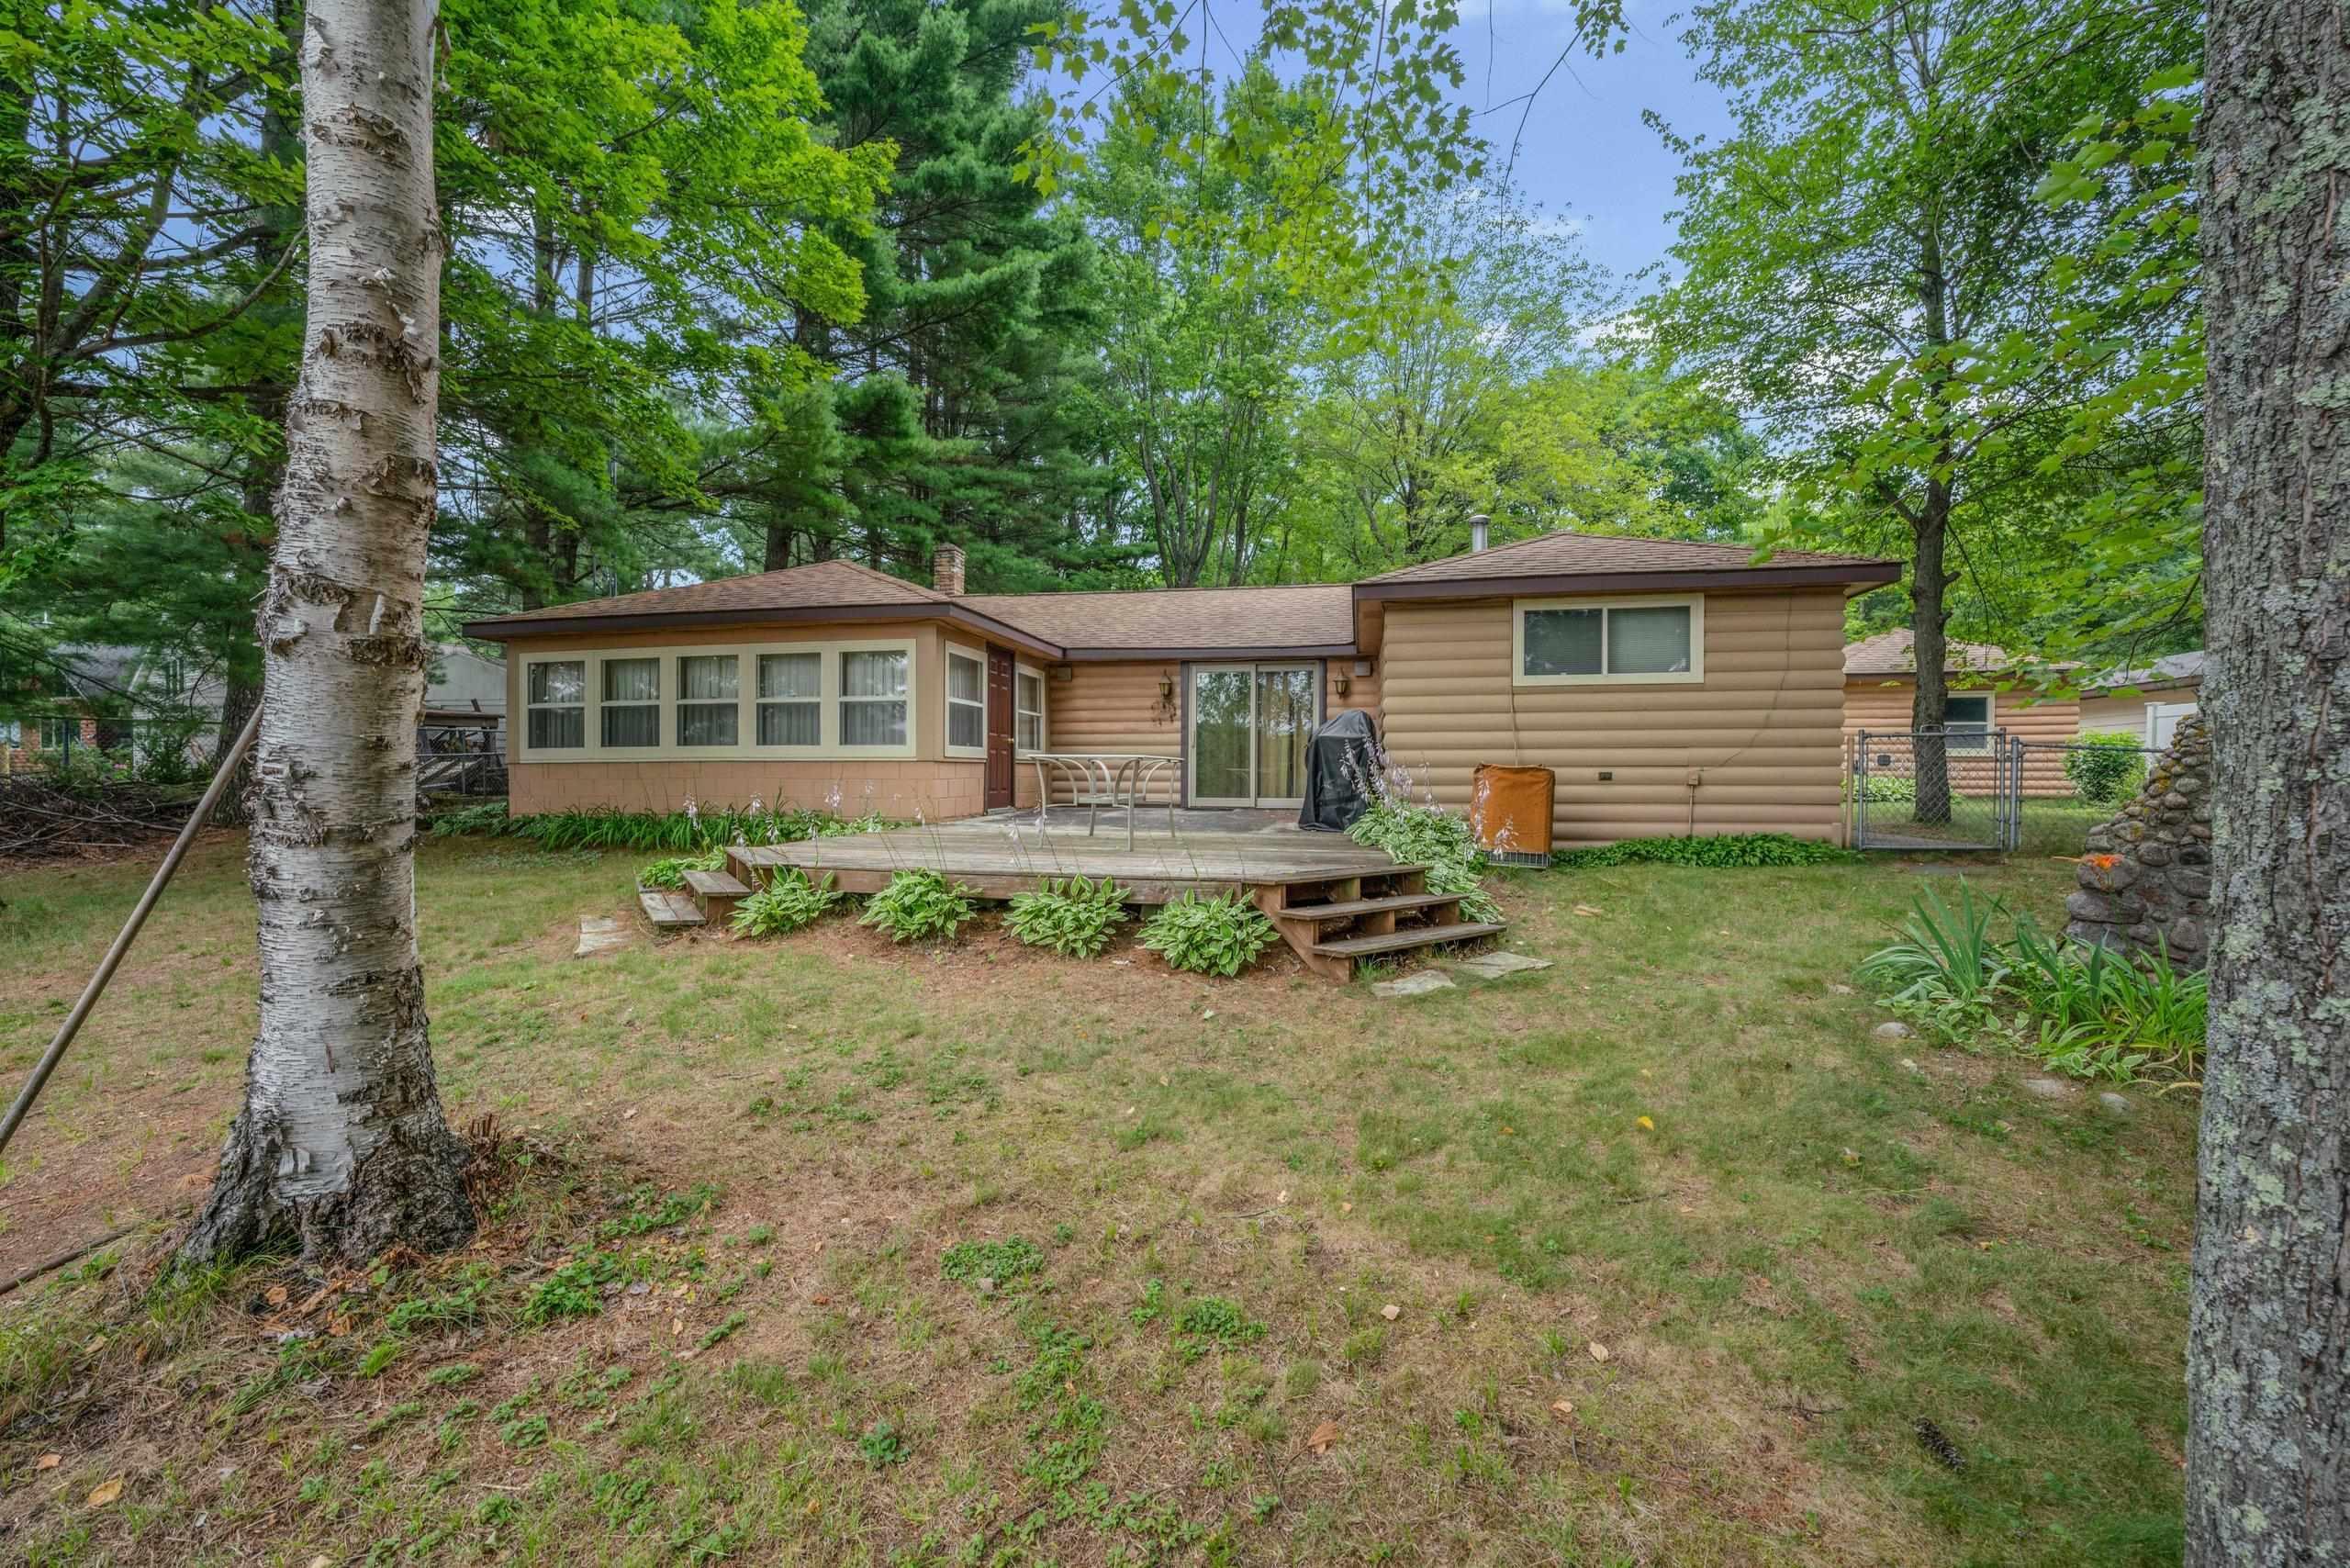 Lake Homes For Sale in Green Bay, Oshkosh, Appleton, Fox Cities ...